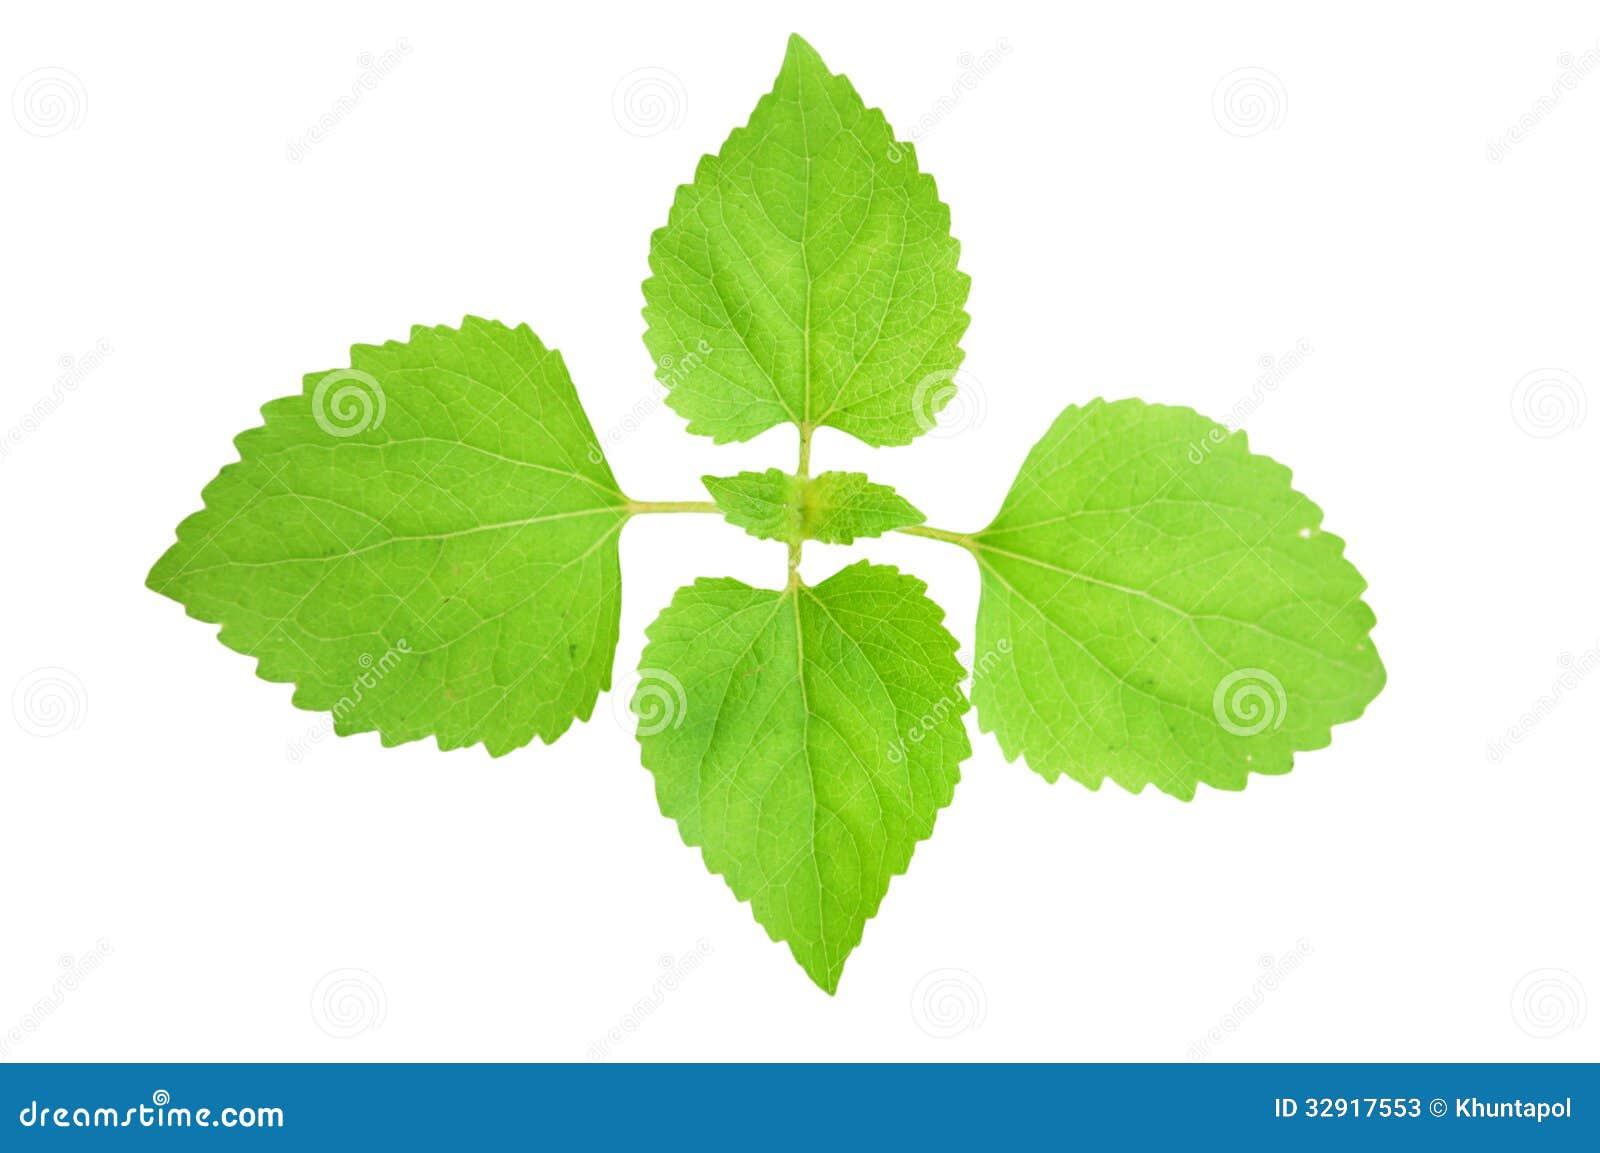 jeune plante verte sur le fond blanc image stock image. Black Bedroom Furniture Sets. Home Design Ideas